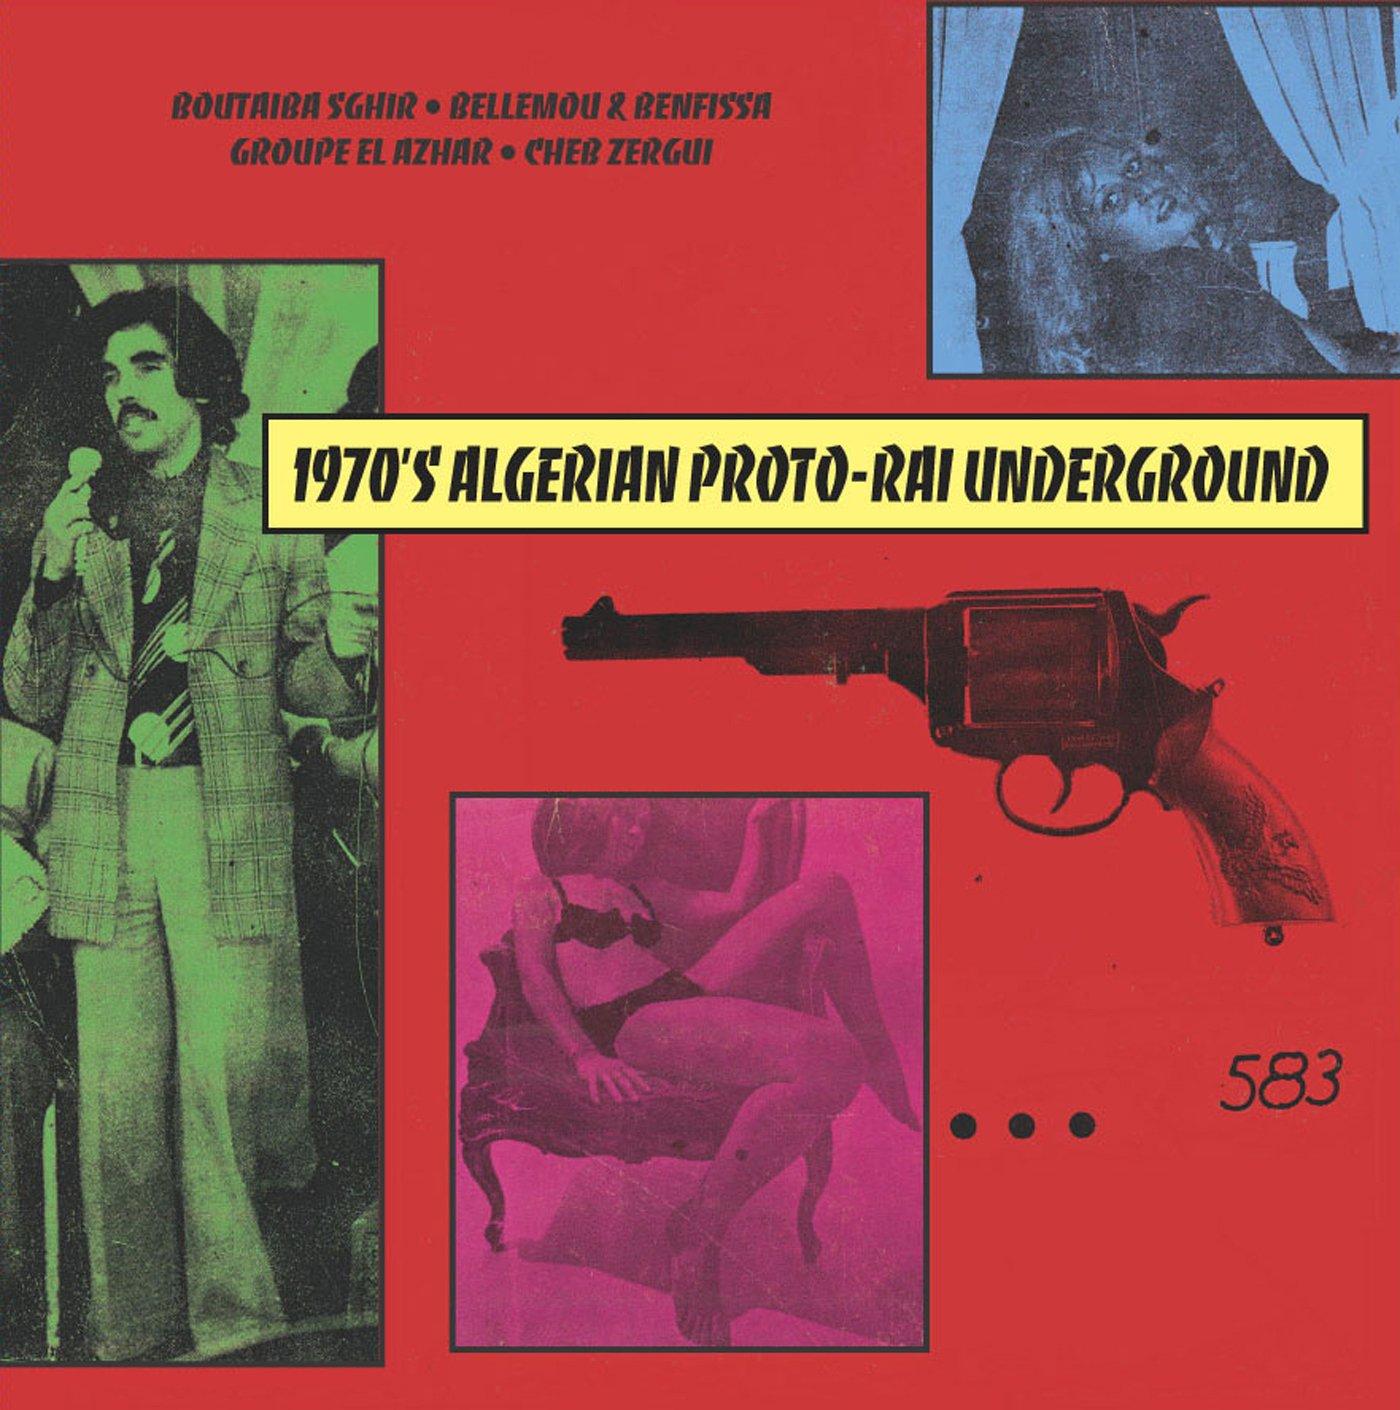 1970's Algerian Proto-rai Underground